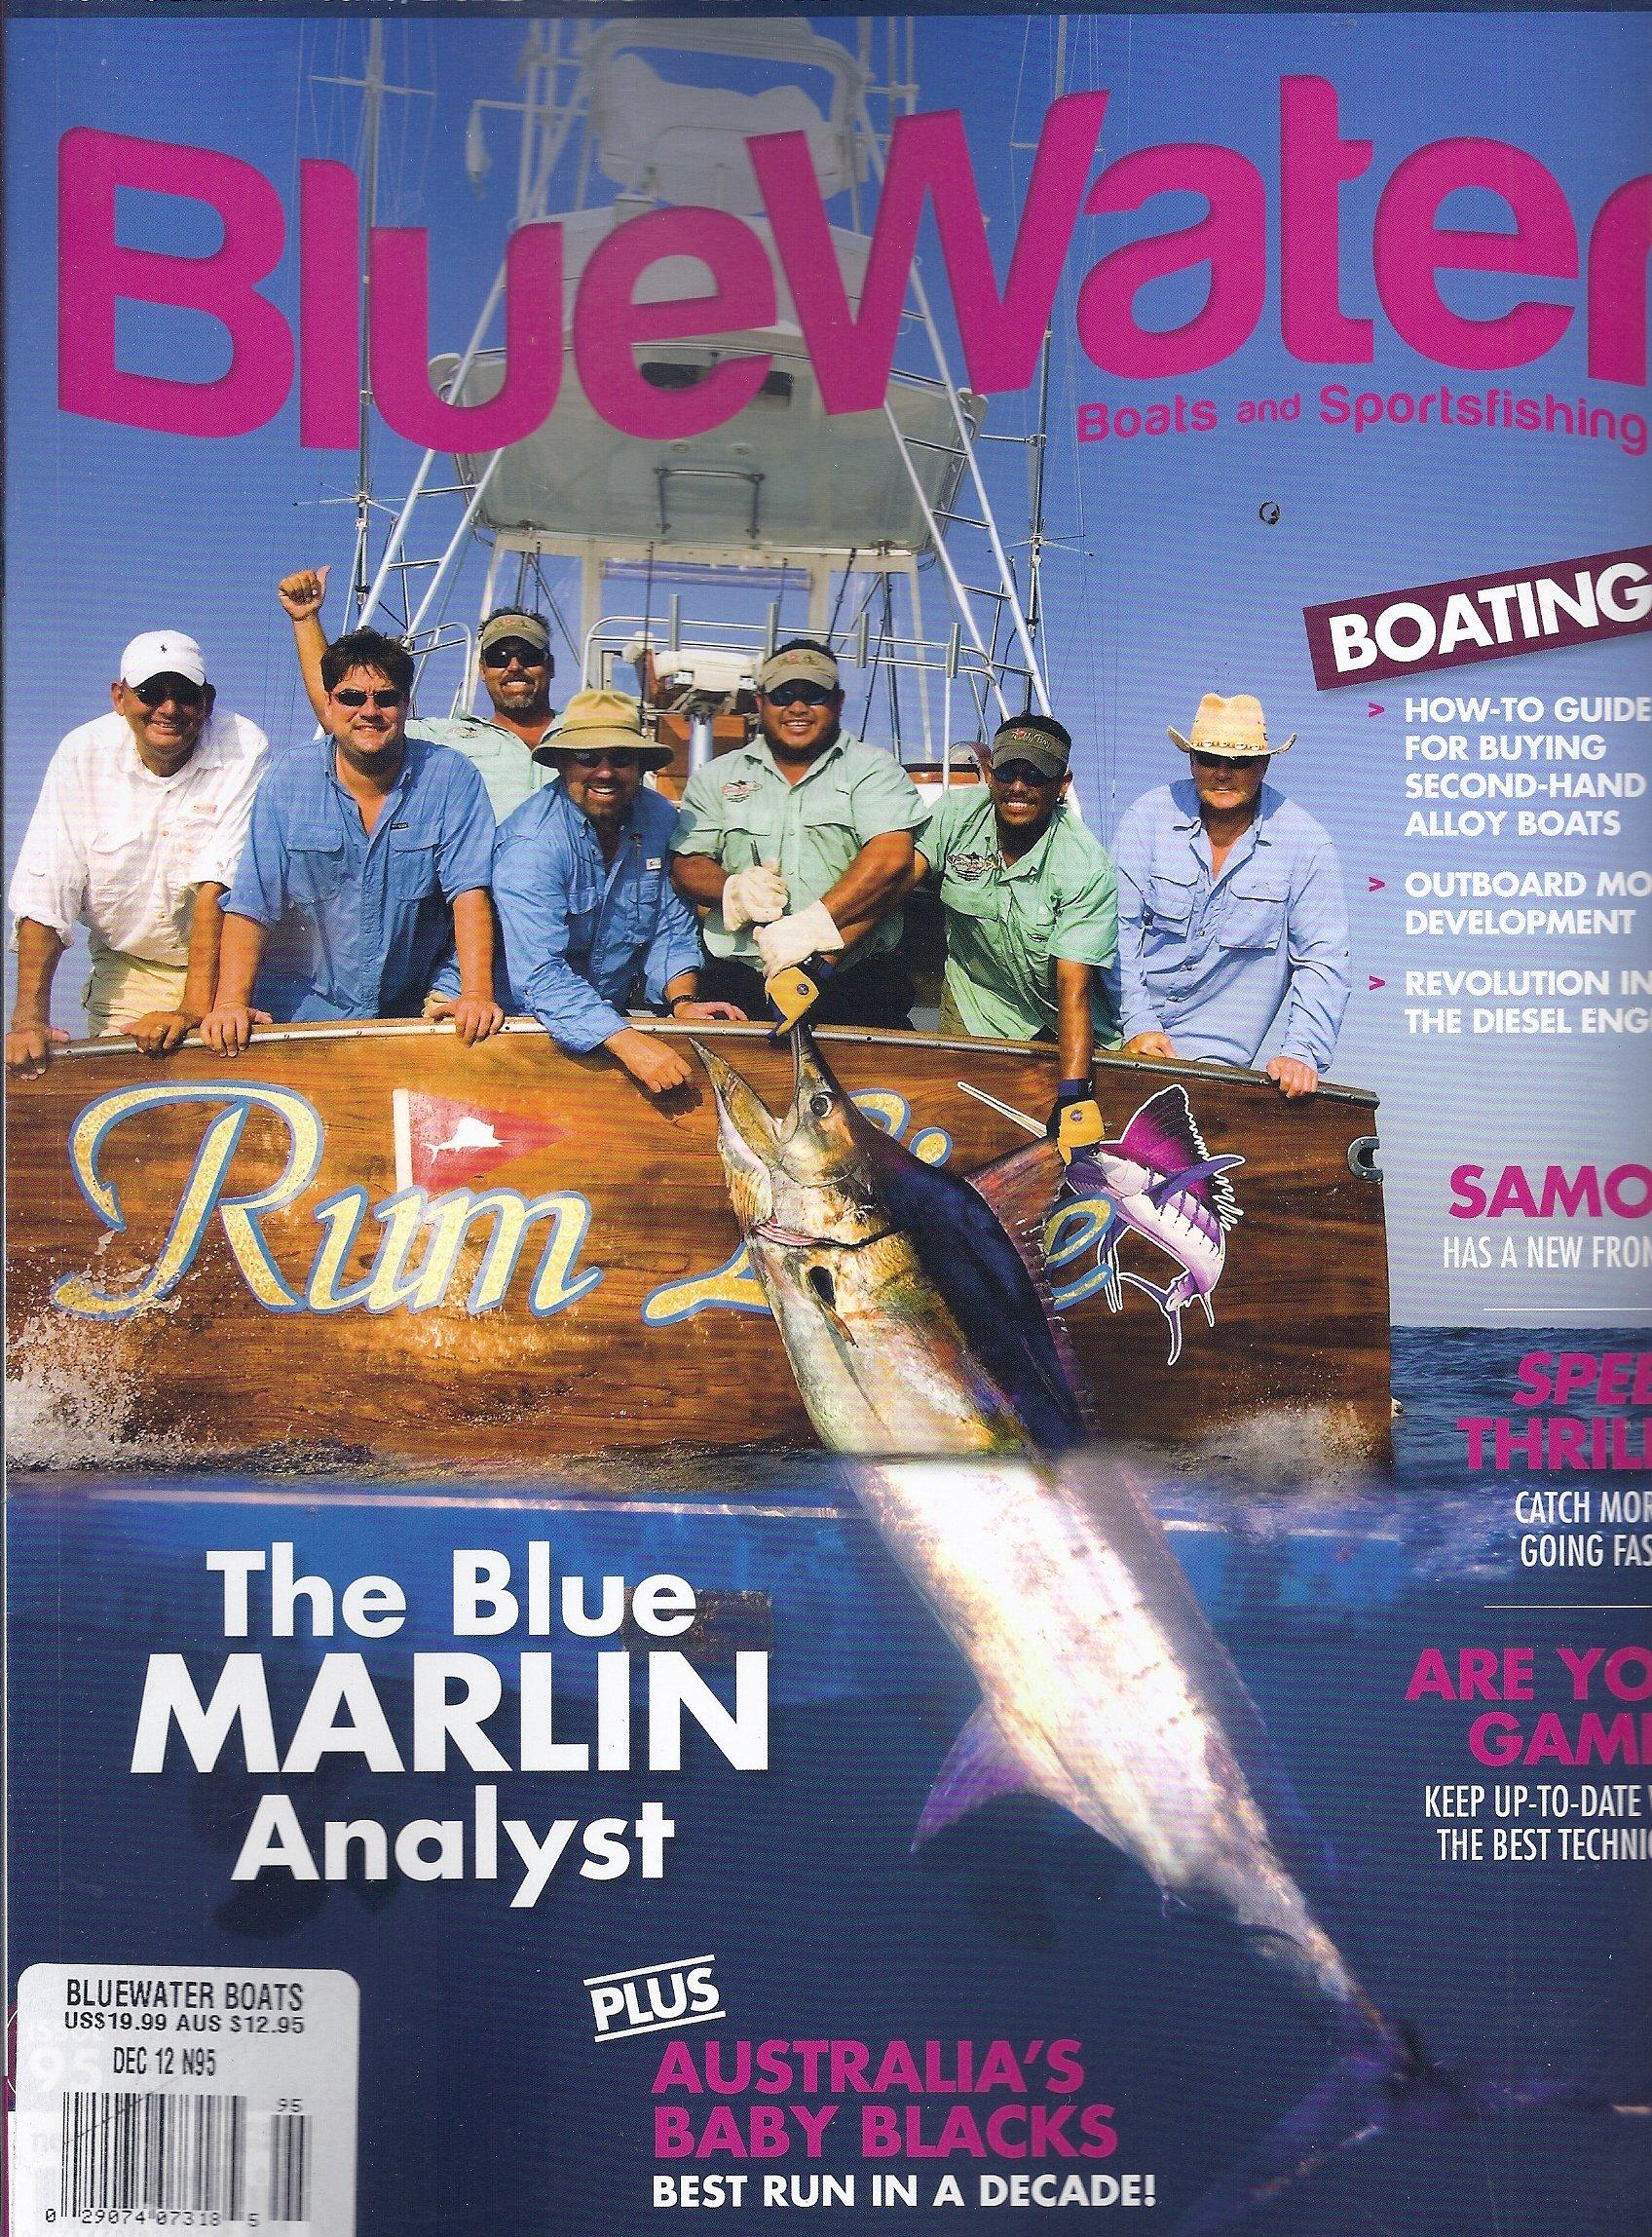 Bluewater Boats and Sportsfishing (January/February 2013) PDF